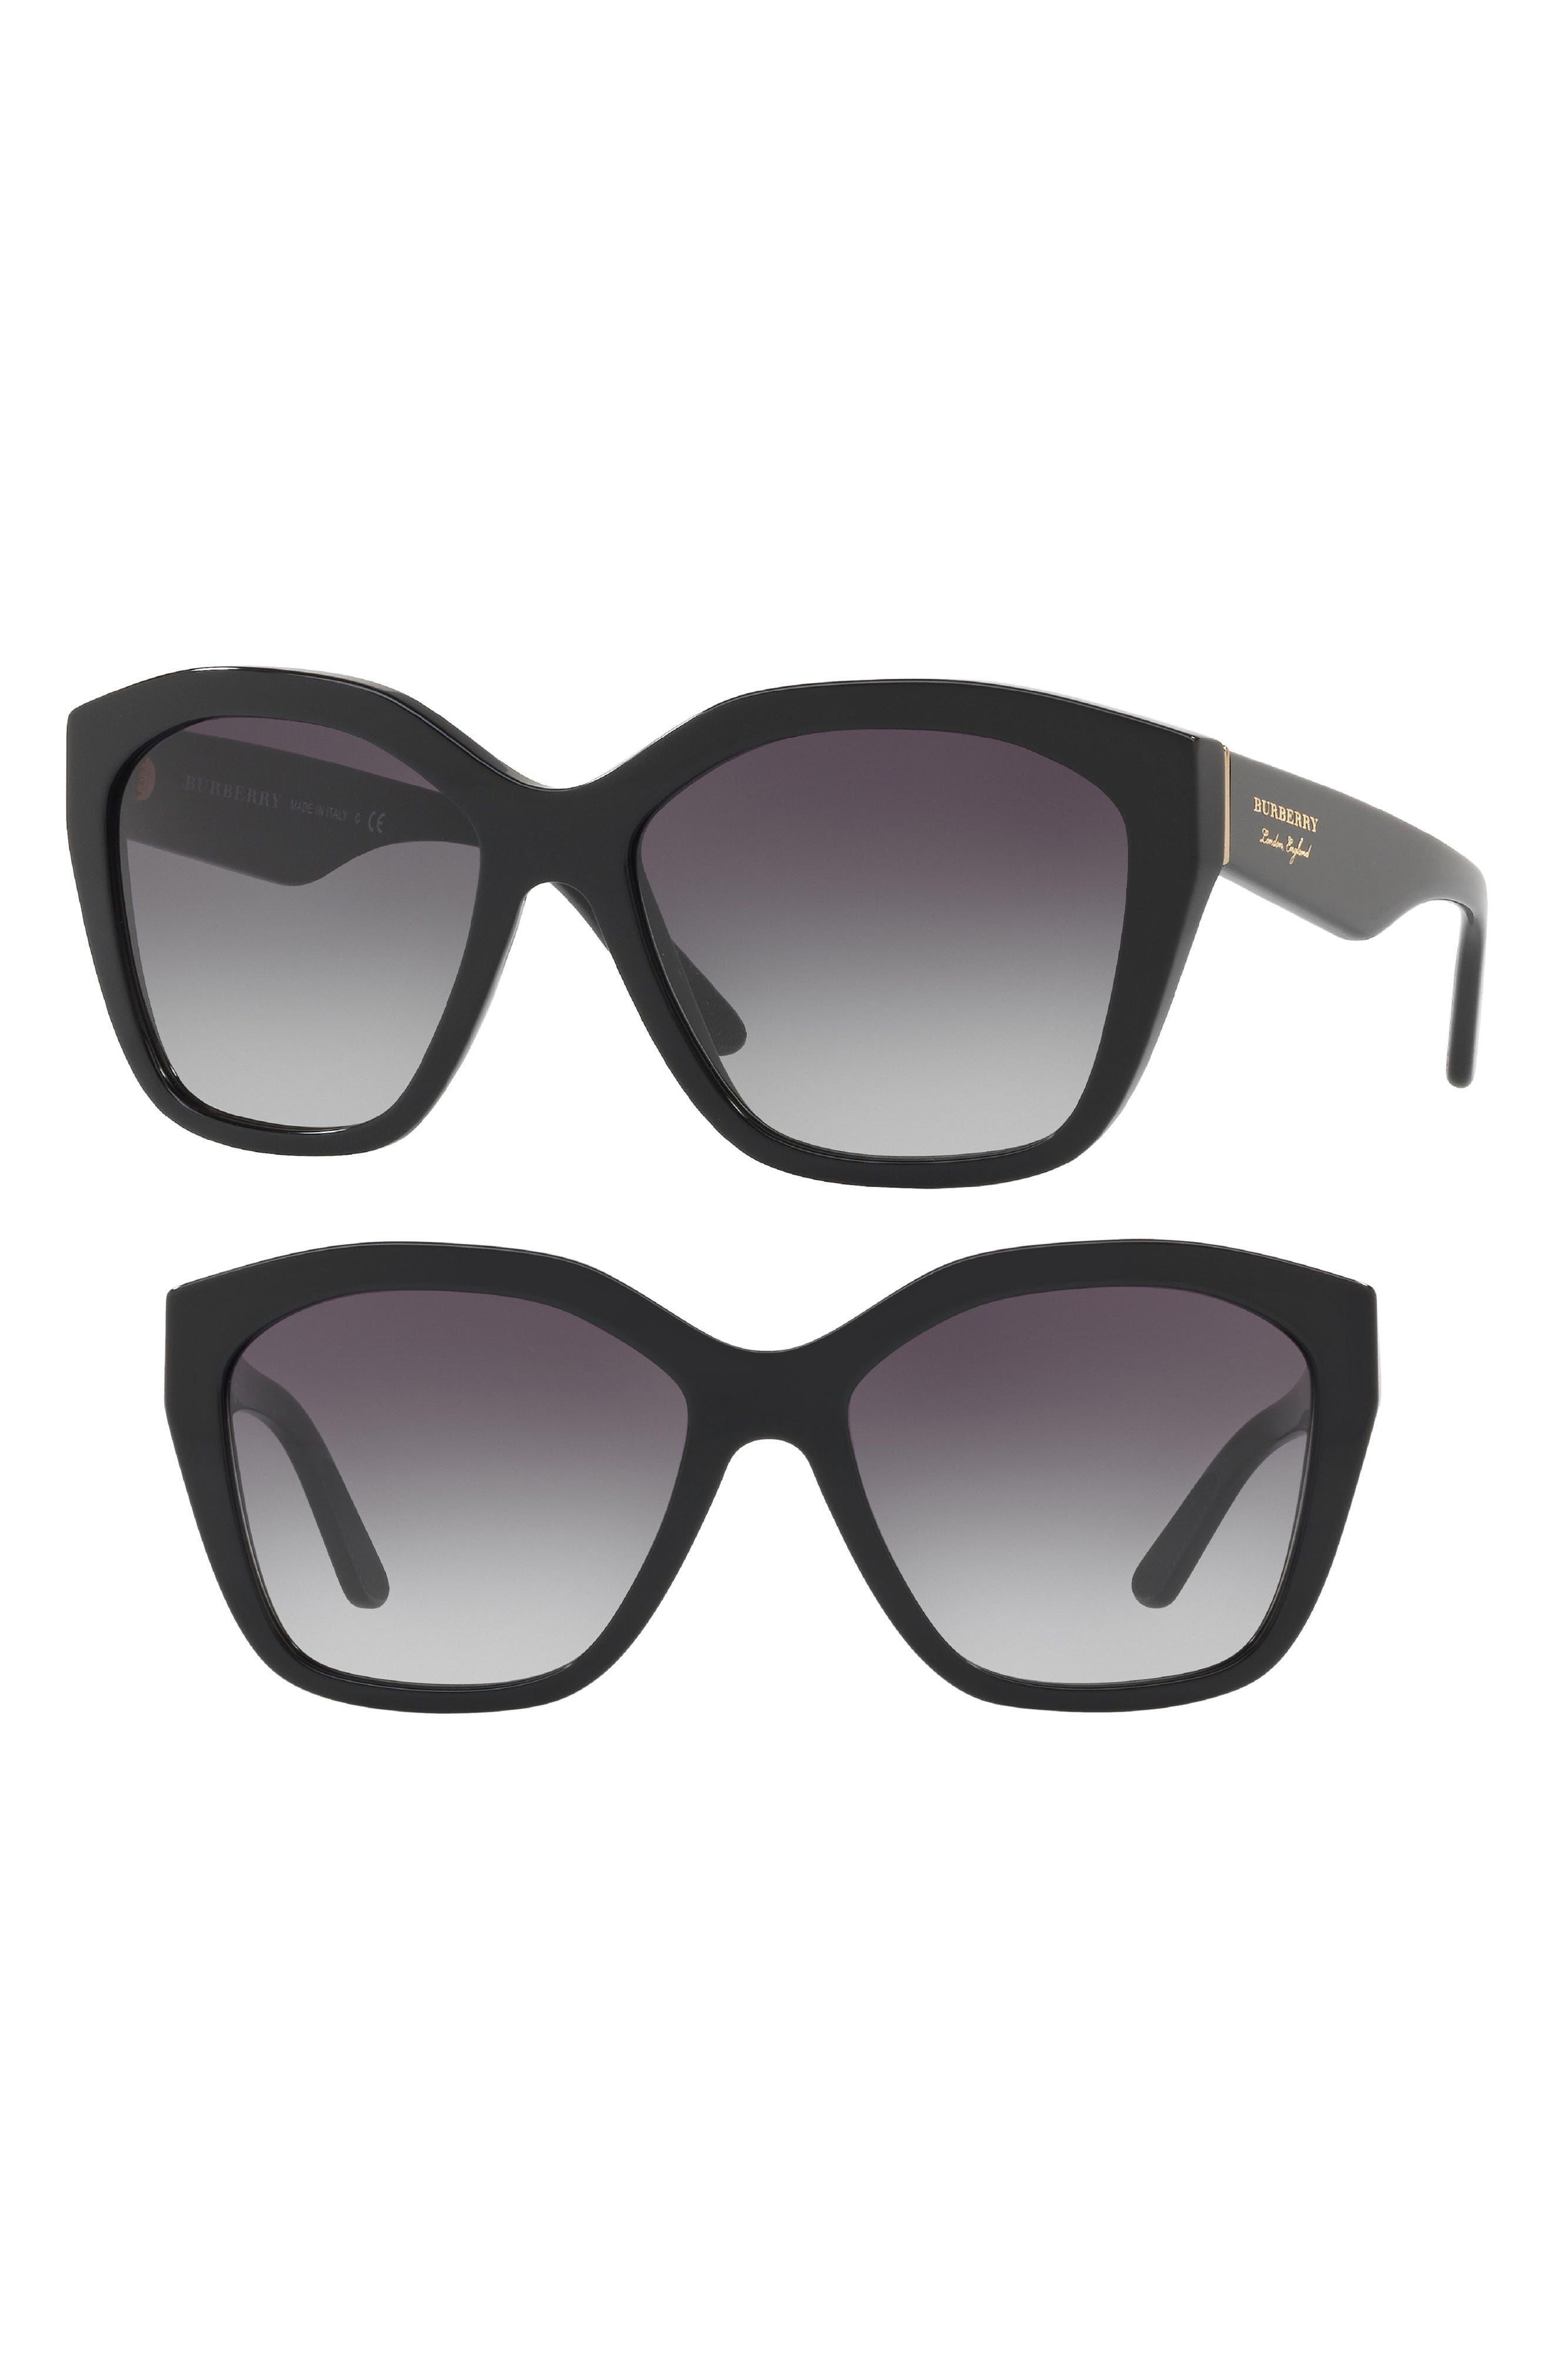 57mm Gradient Sunglasses,                             Alternate thumbnail 2, color,                             BLACK